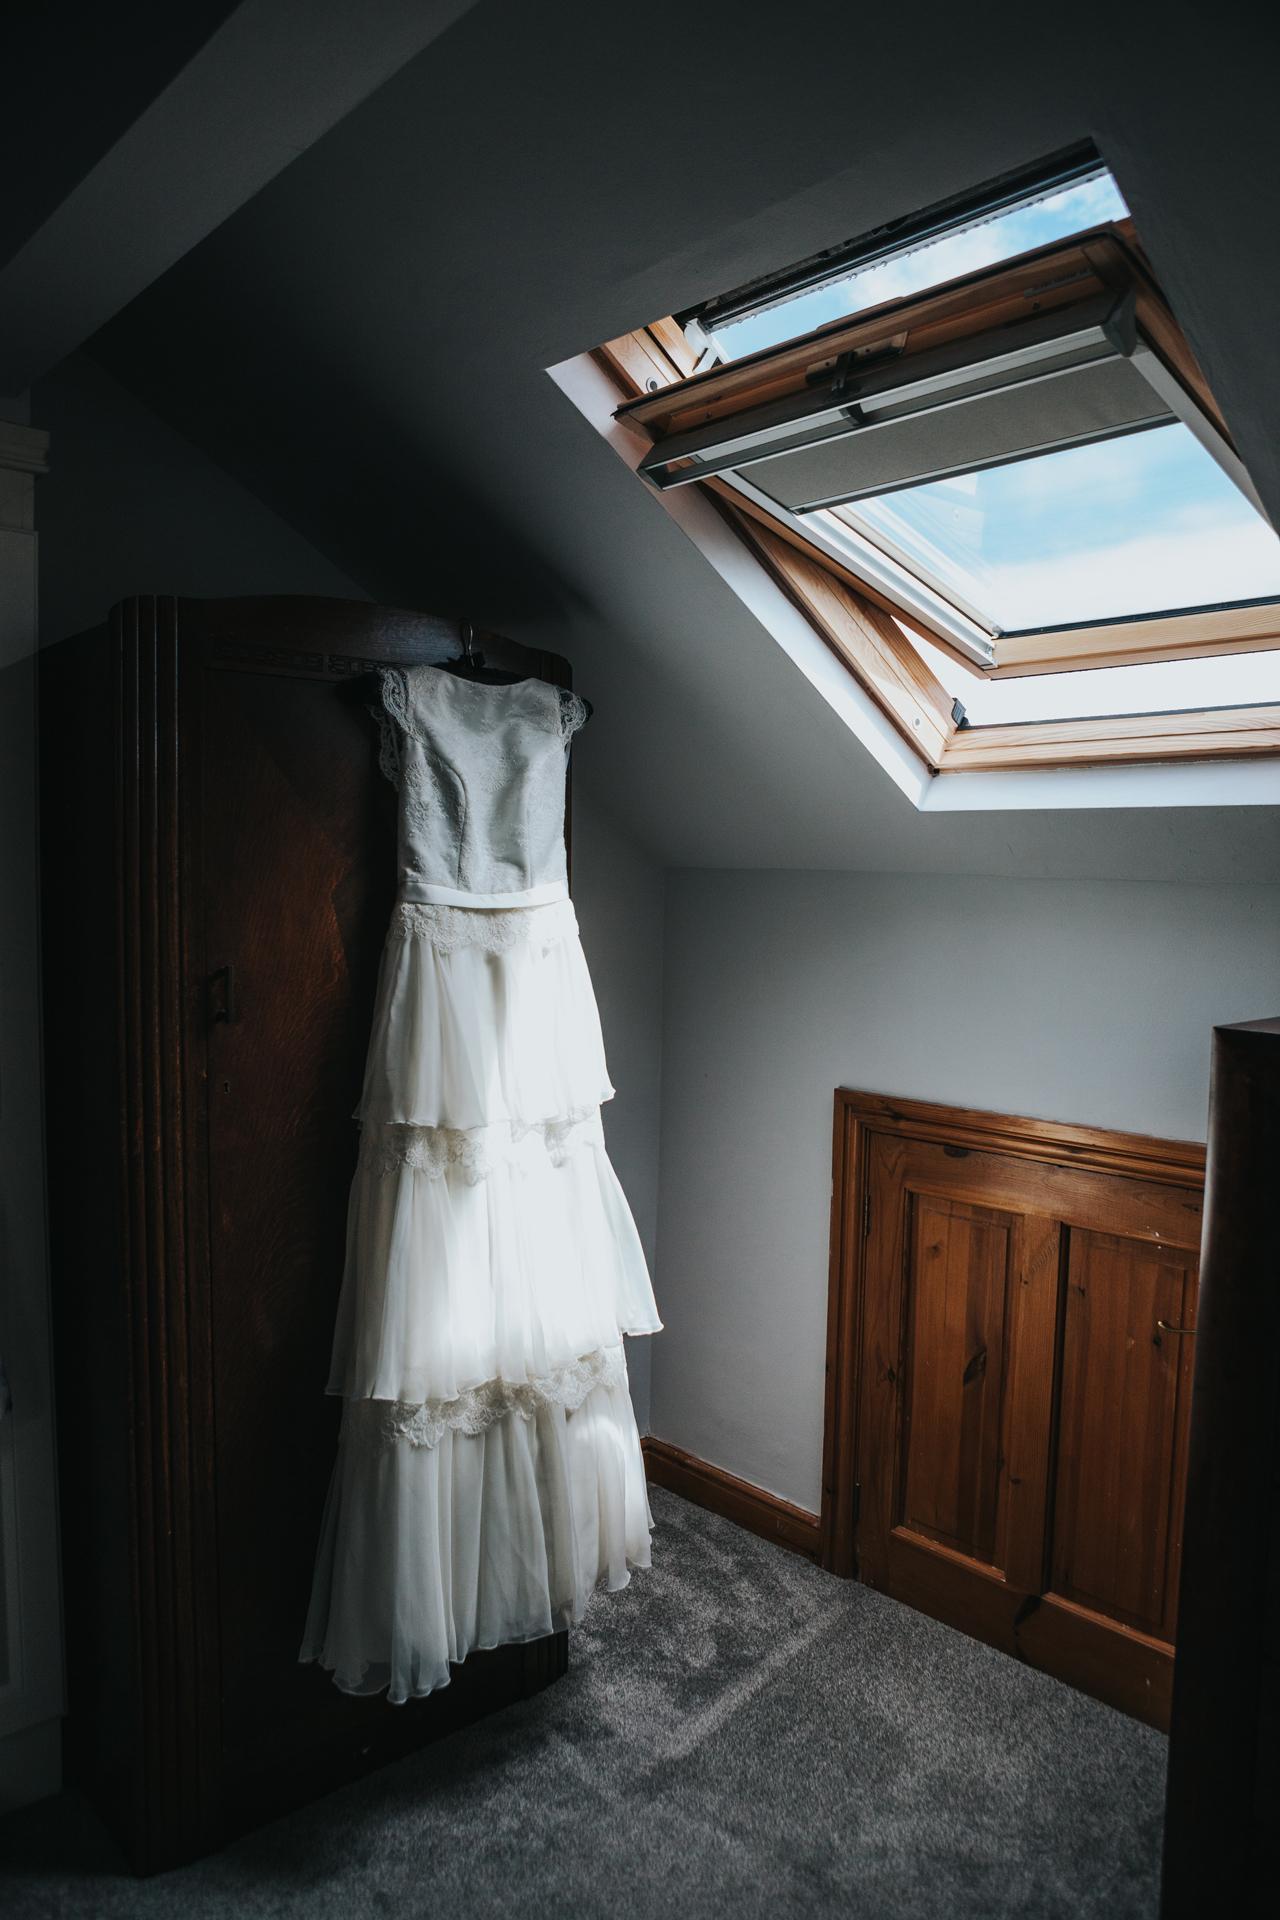 Brides dress hangs on wardrobe, Manchester.